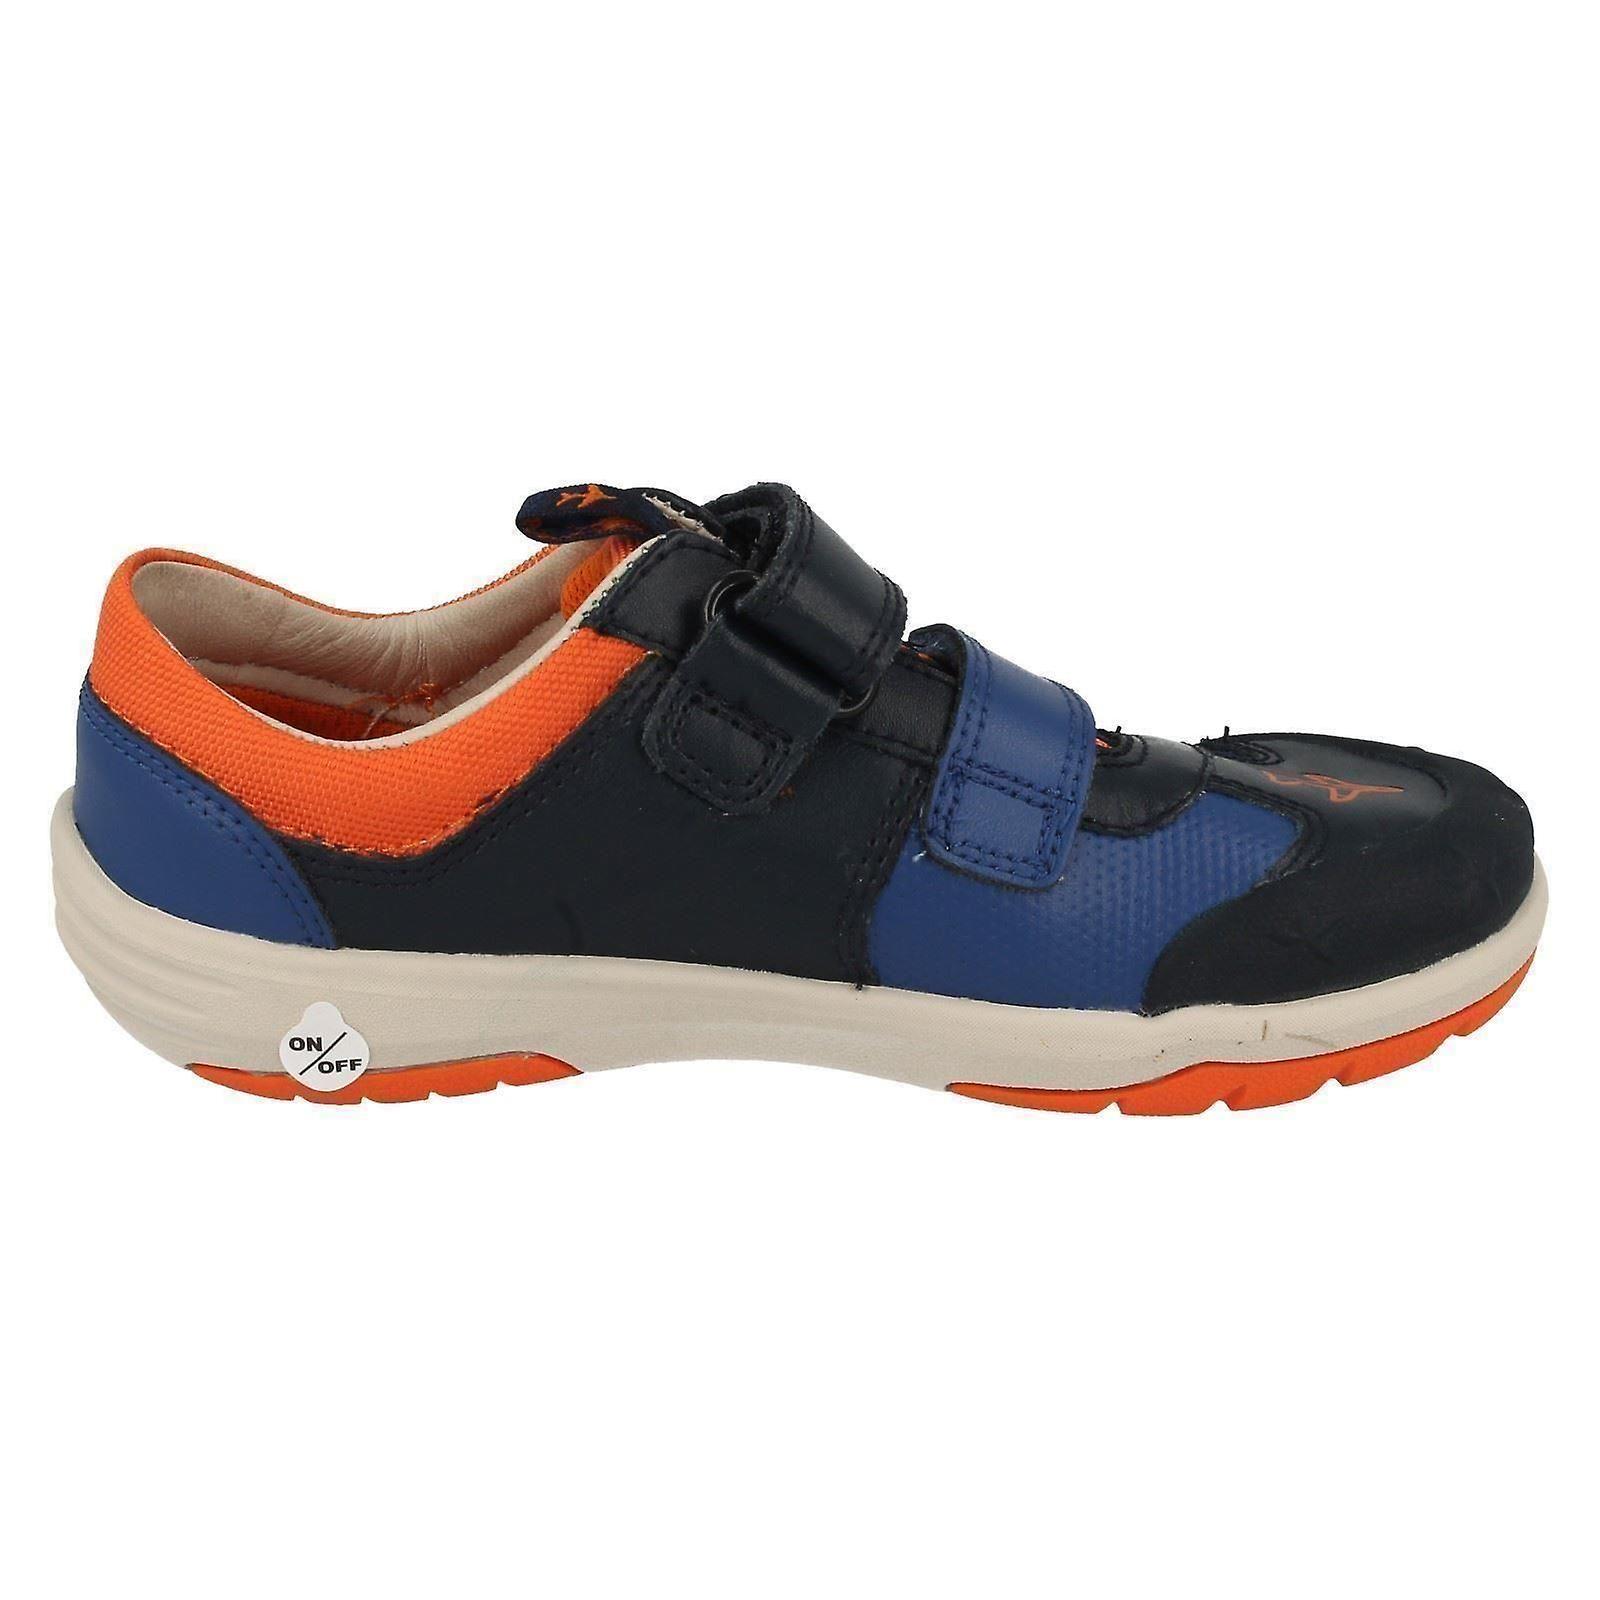 Garçons Clarks Casual Shoes Jetsky Buzz